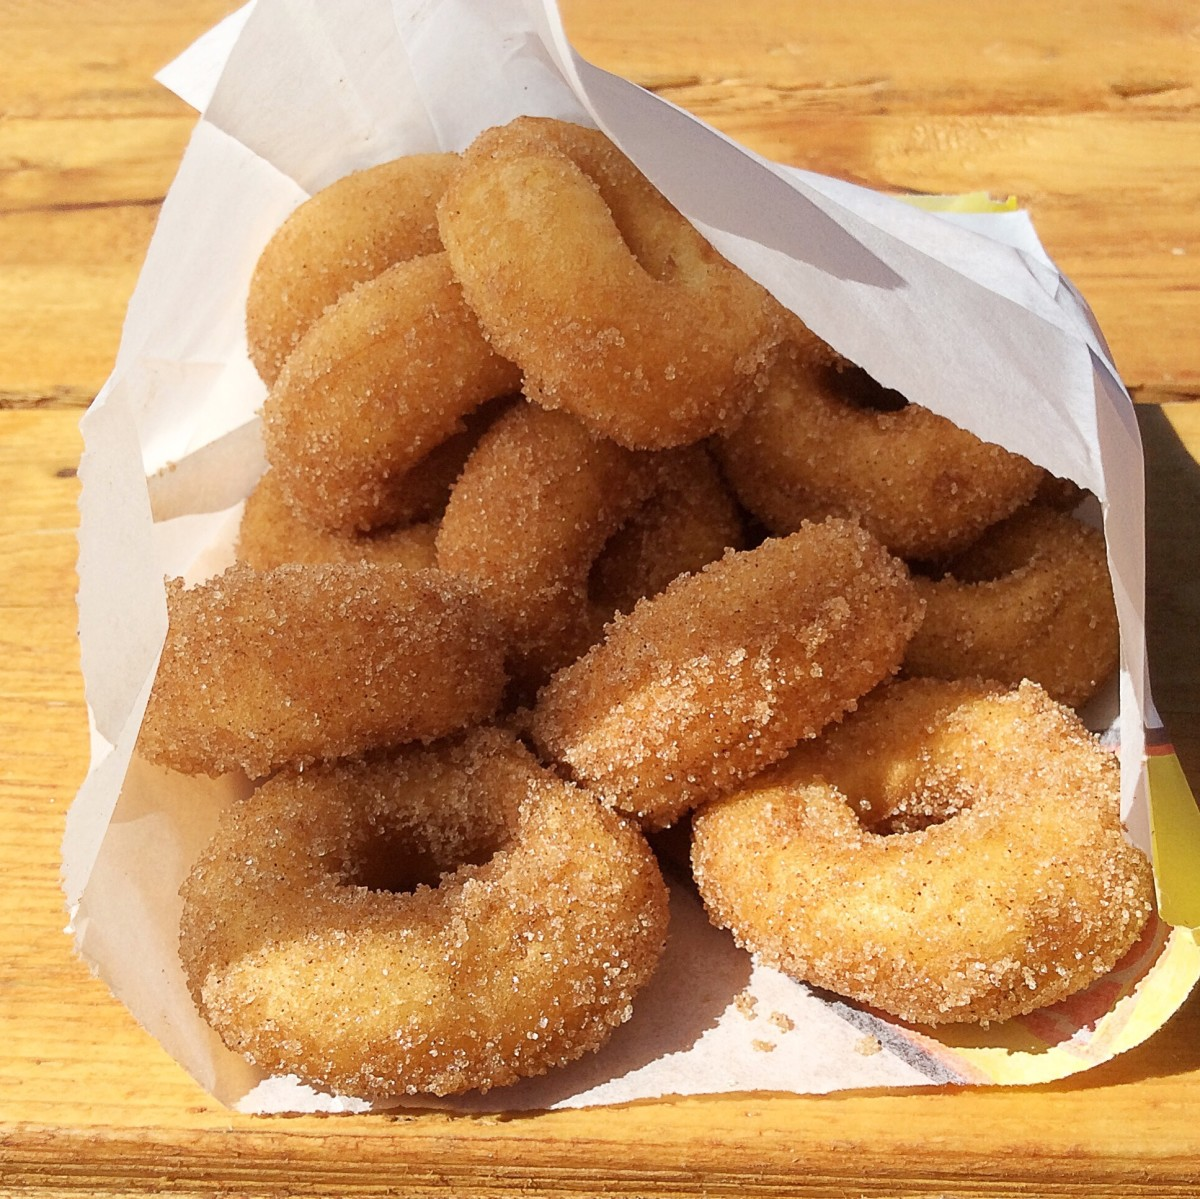 PNE mini donuts